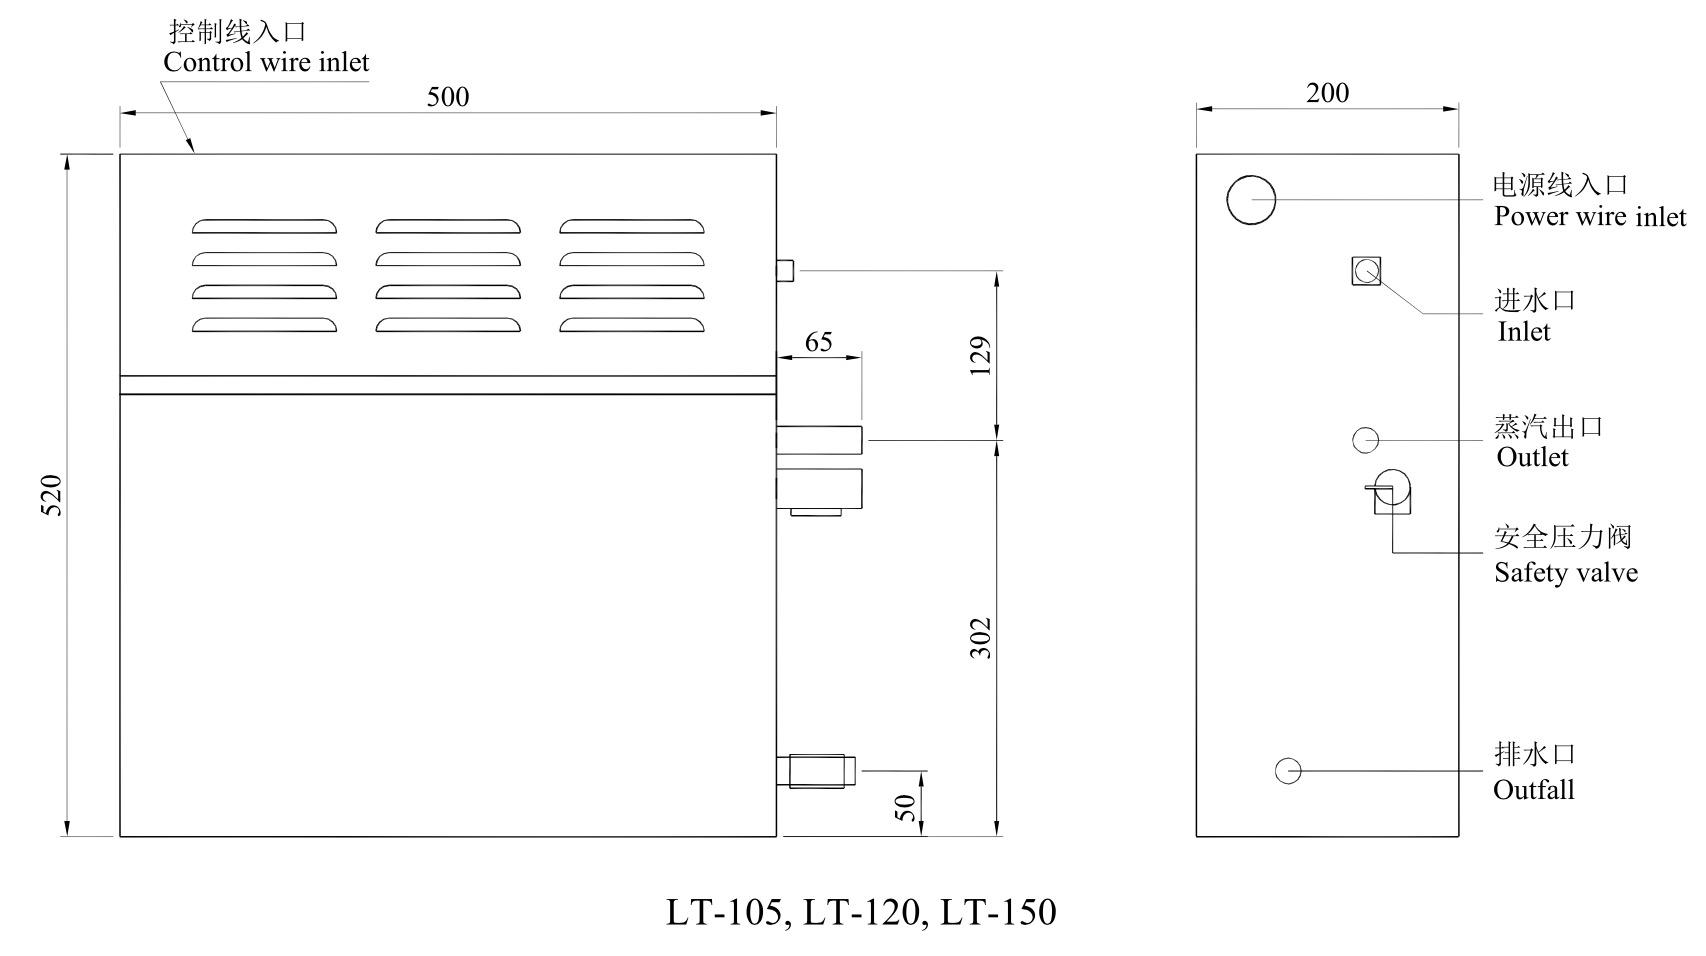 LT-105, LT-120, LT-150